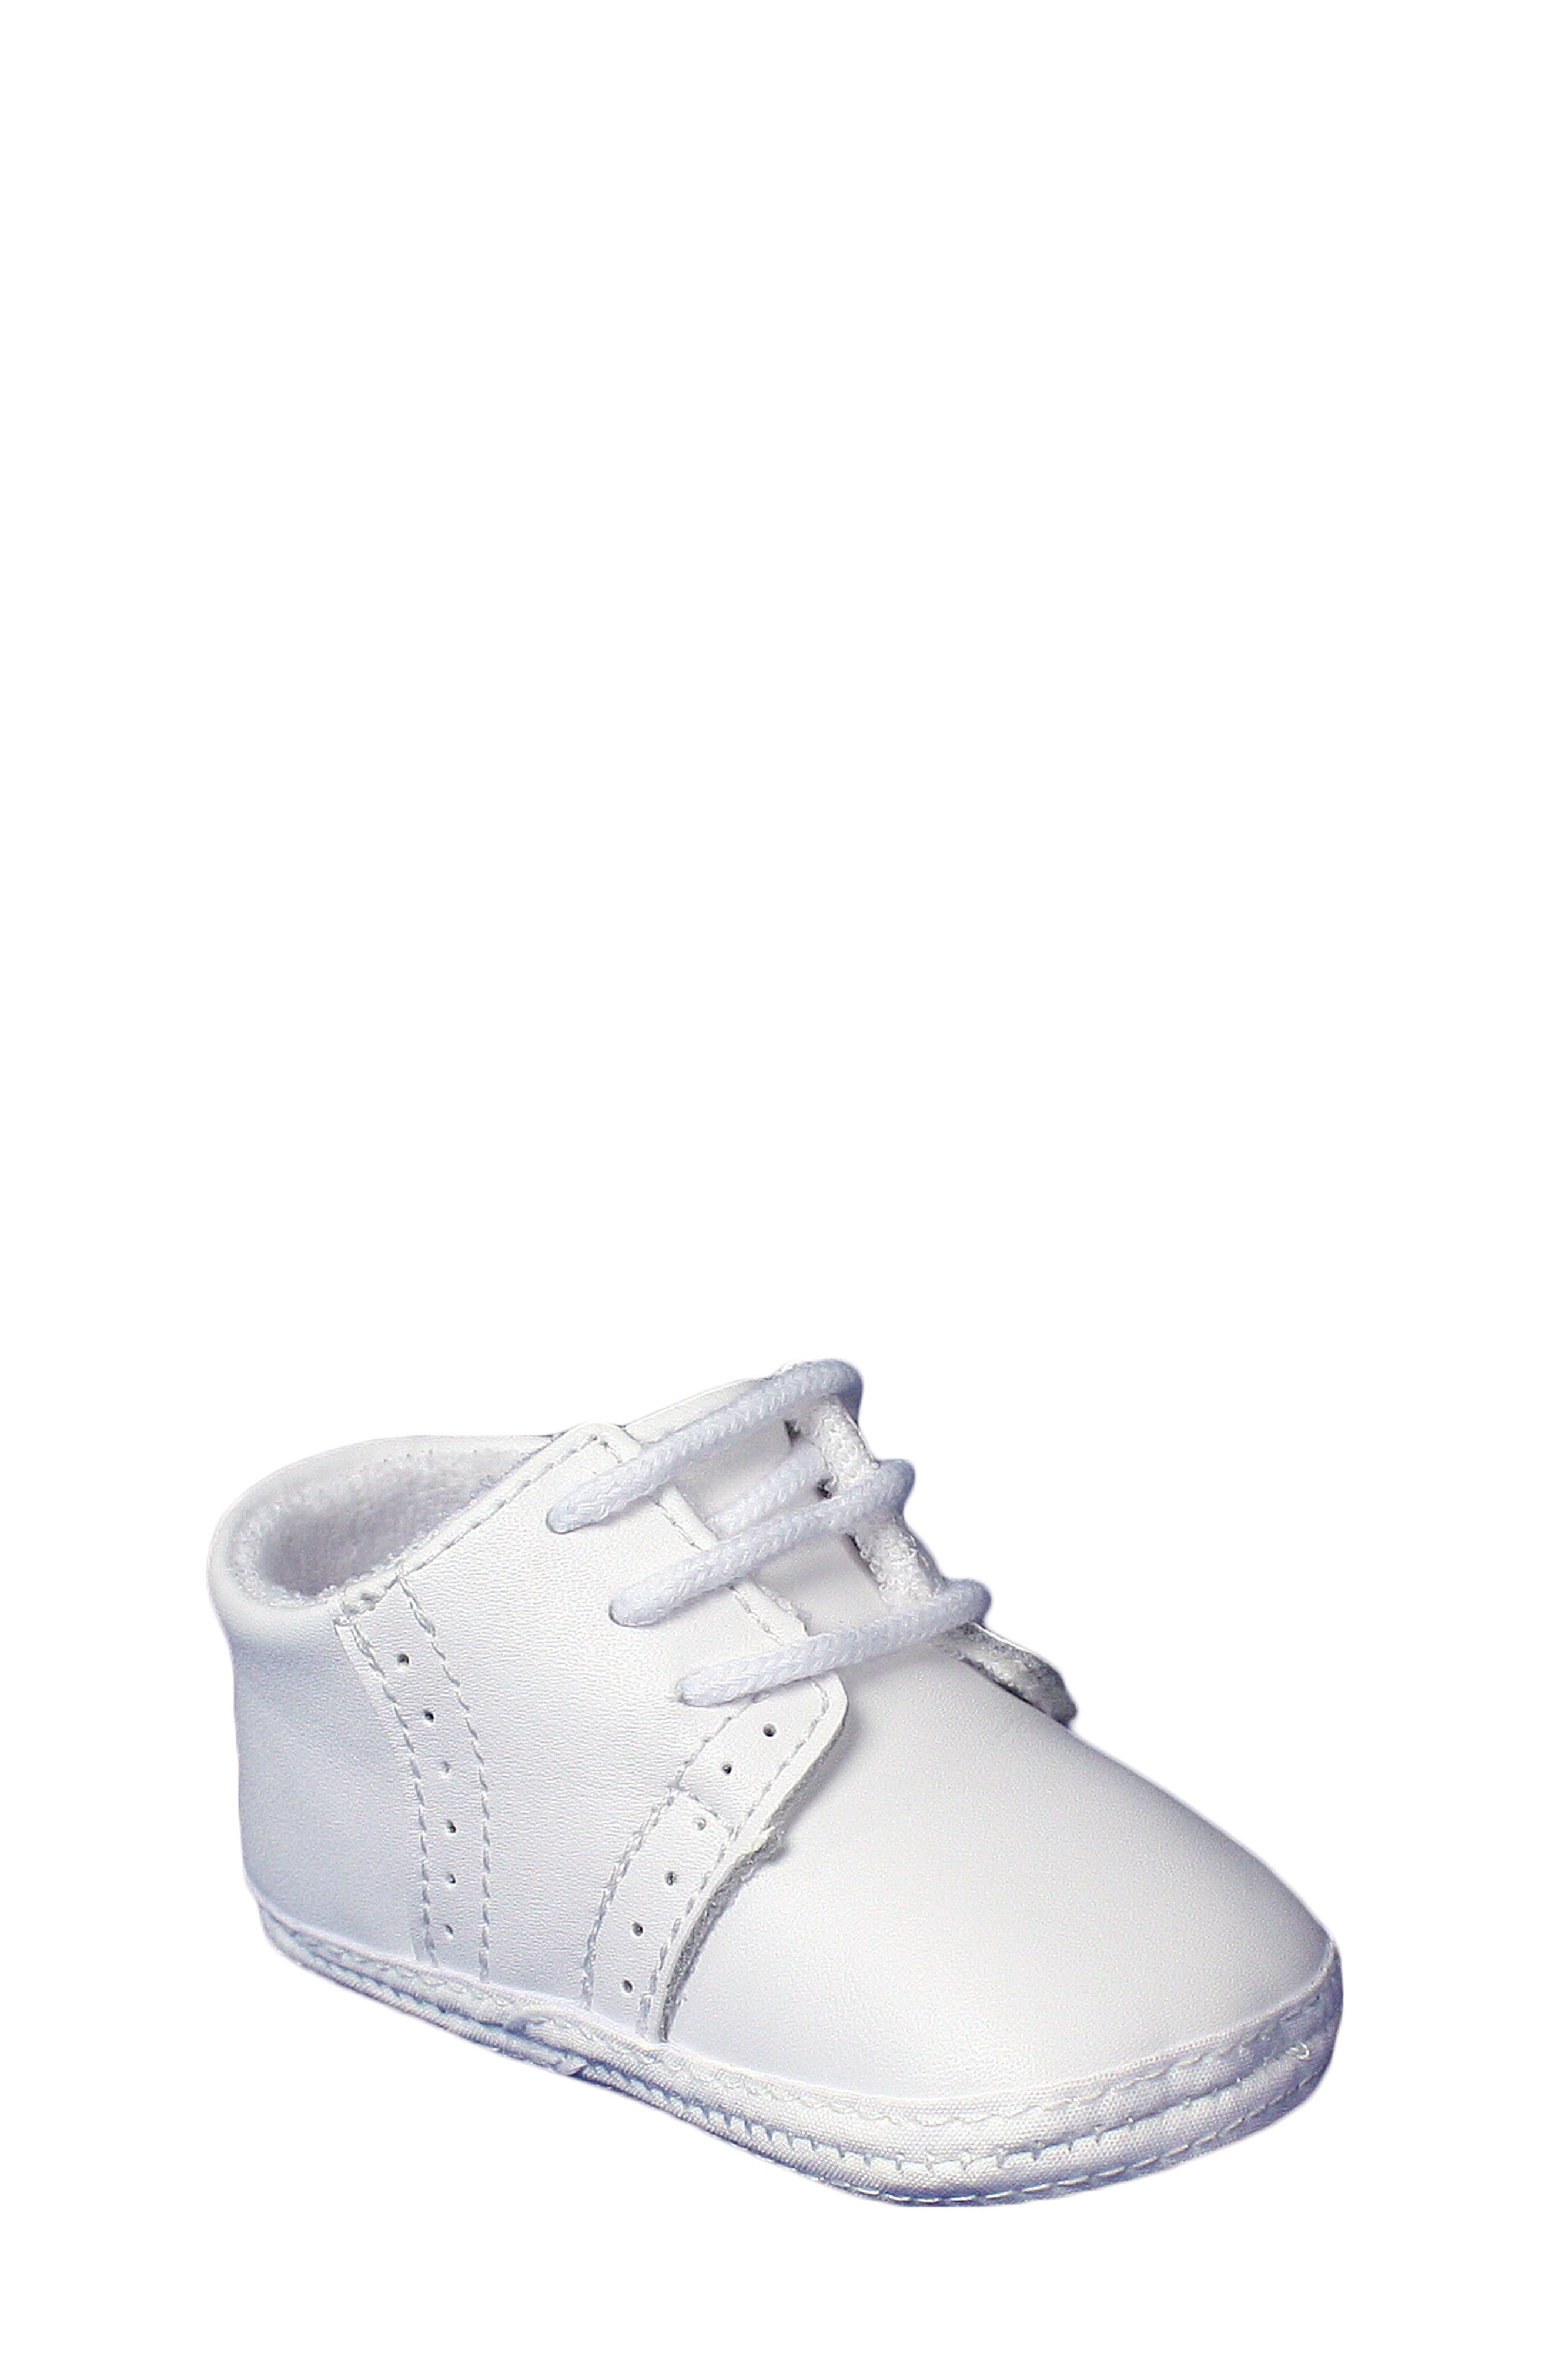 Leather Crib Shoe,                             Alternate thumbnail 5, color,                             White